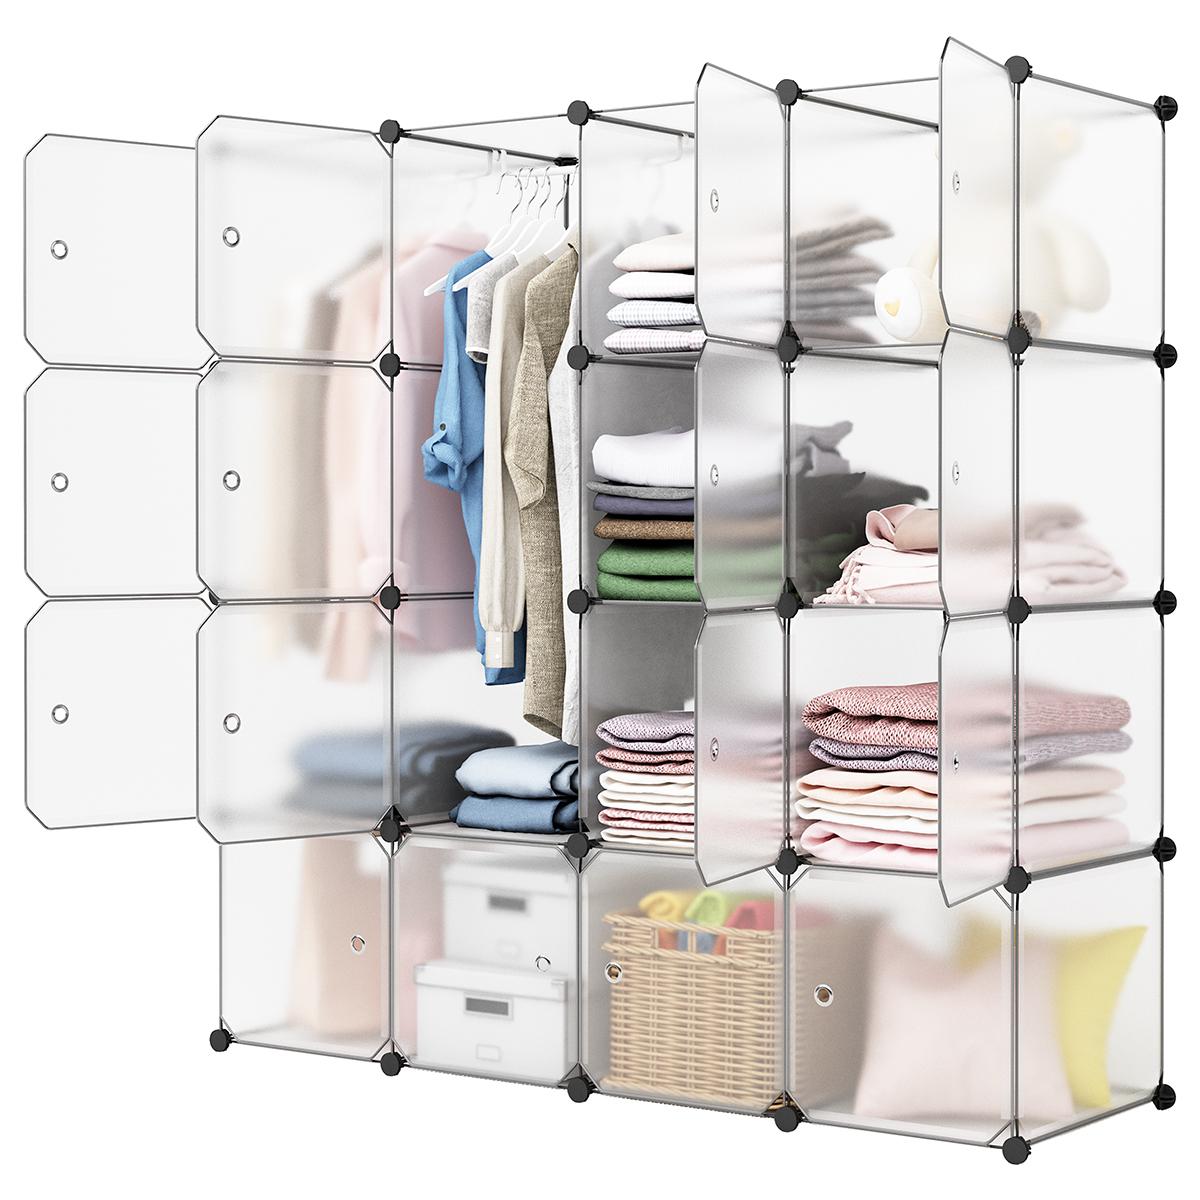 LANGRIA 20-Cube DIY Plastic Shoe Rack Modular Shelving Storage Organizer Cabinet Translucent White